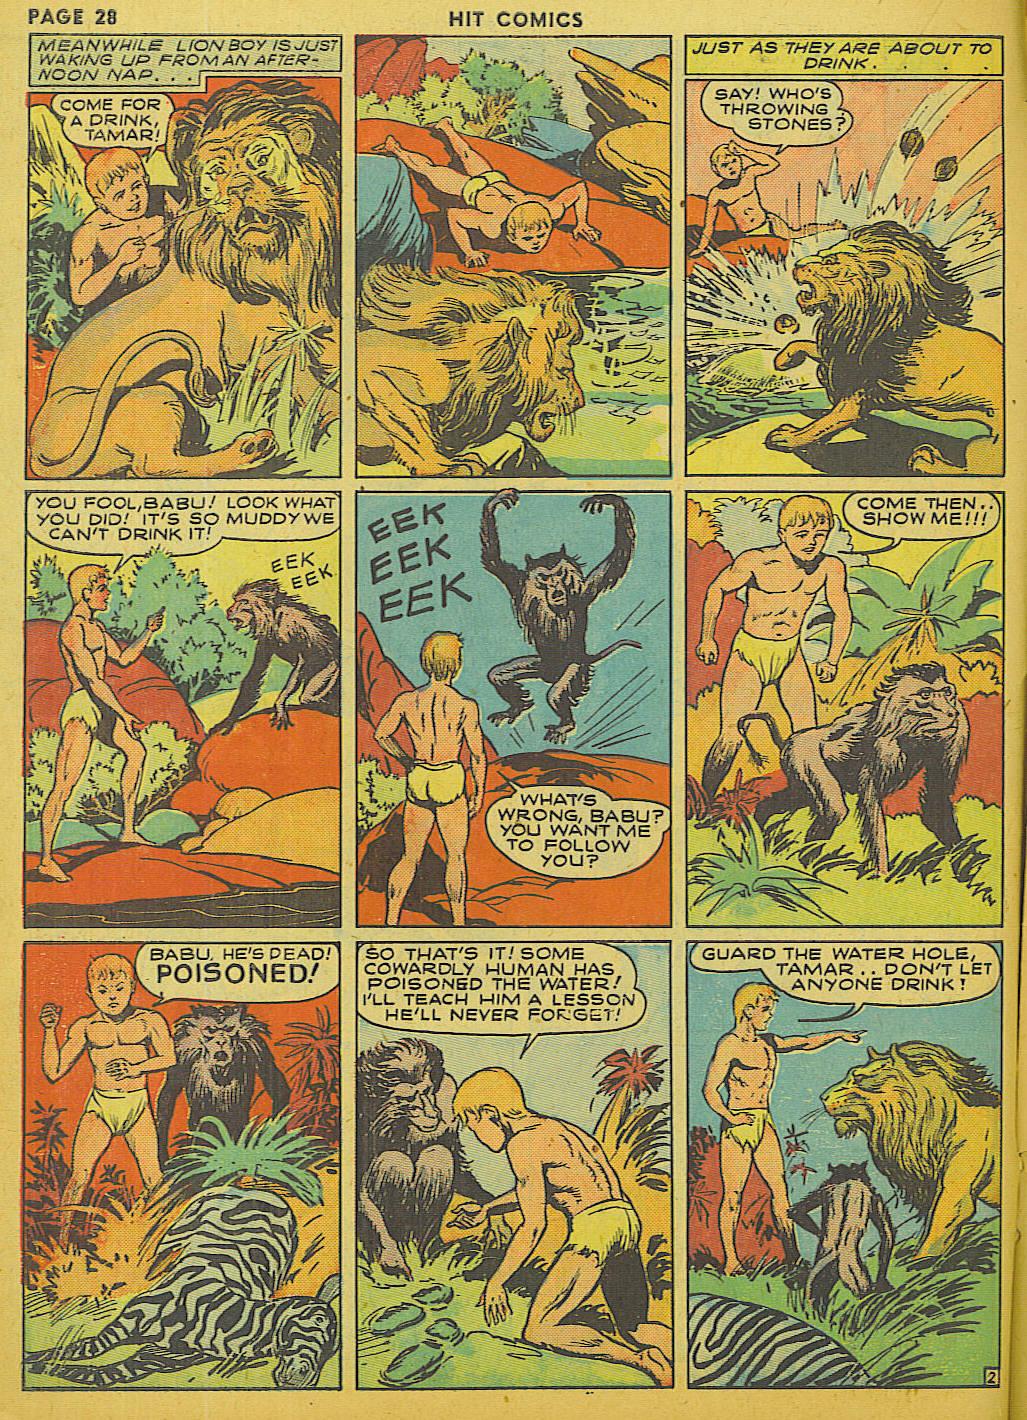 Read online Hit Comics comic -  Issue #13 - 30